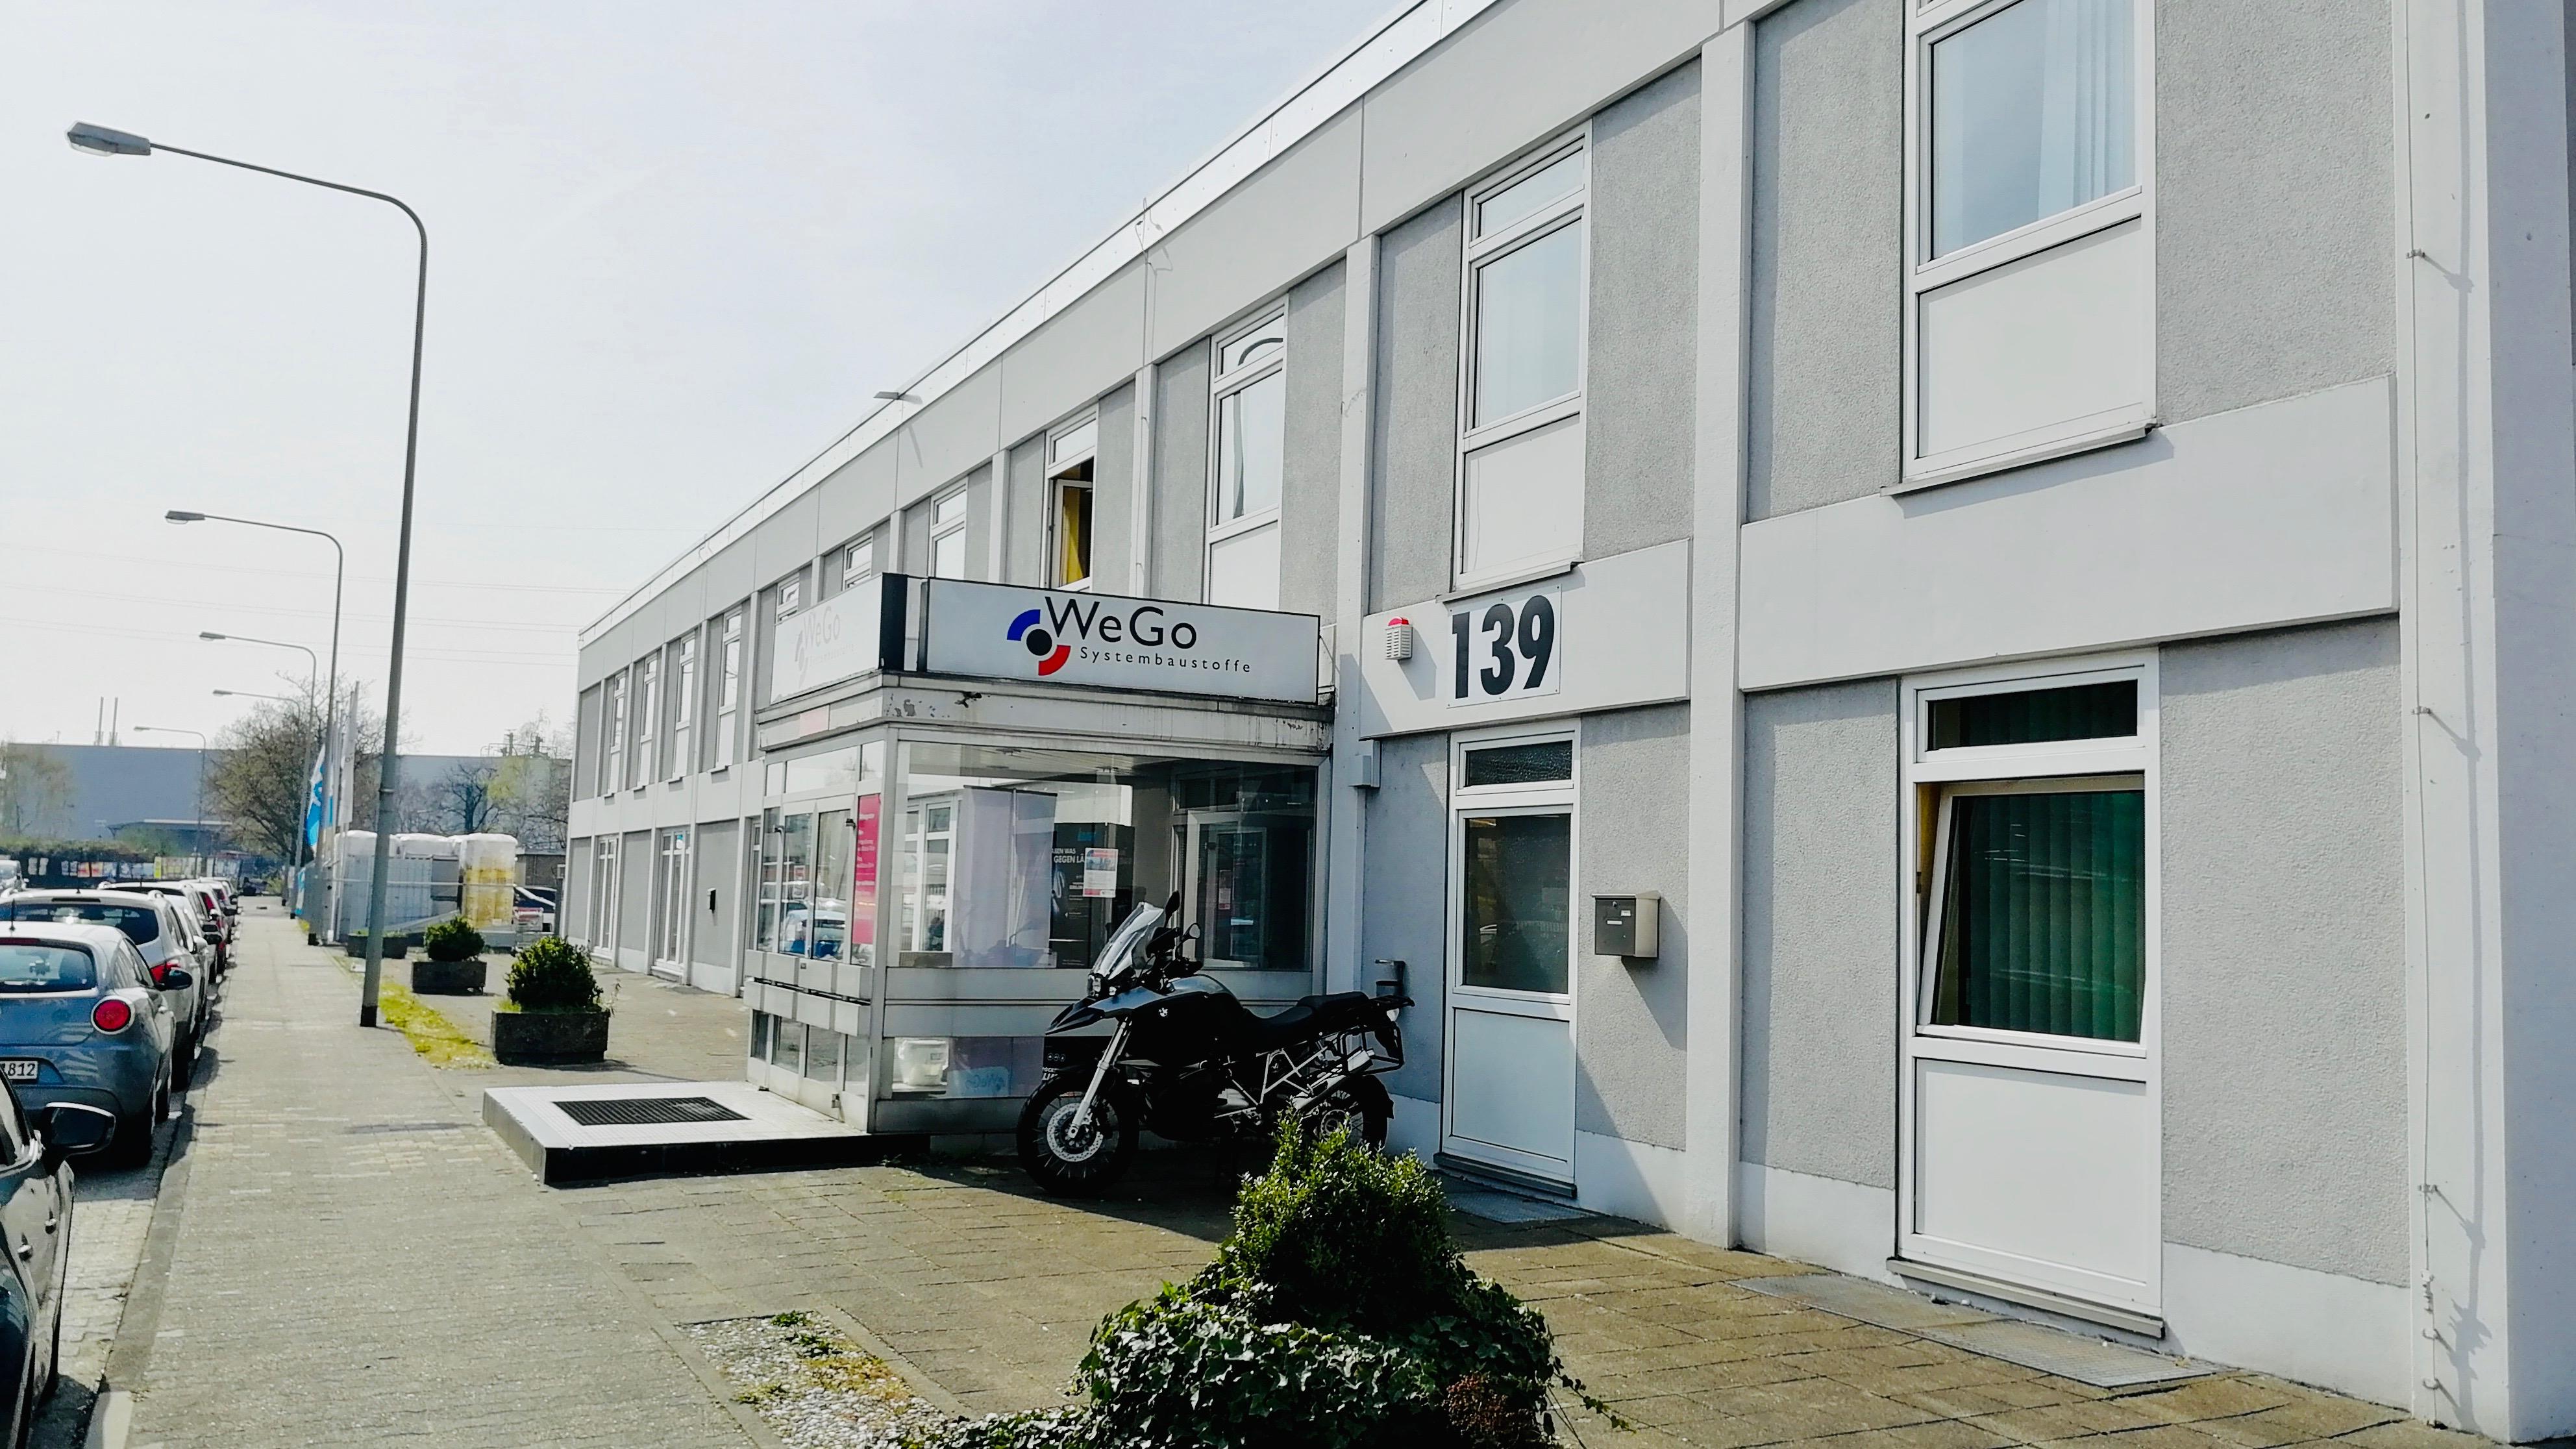 Wego Frankfurt/Main